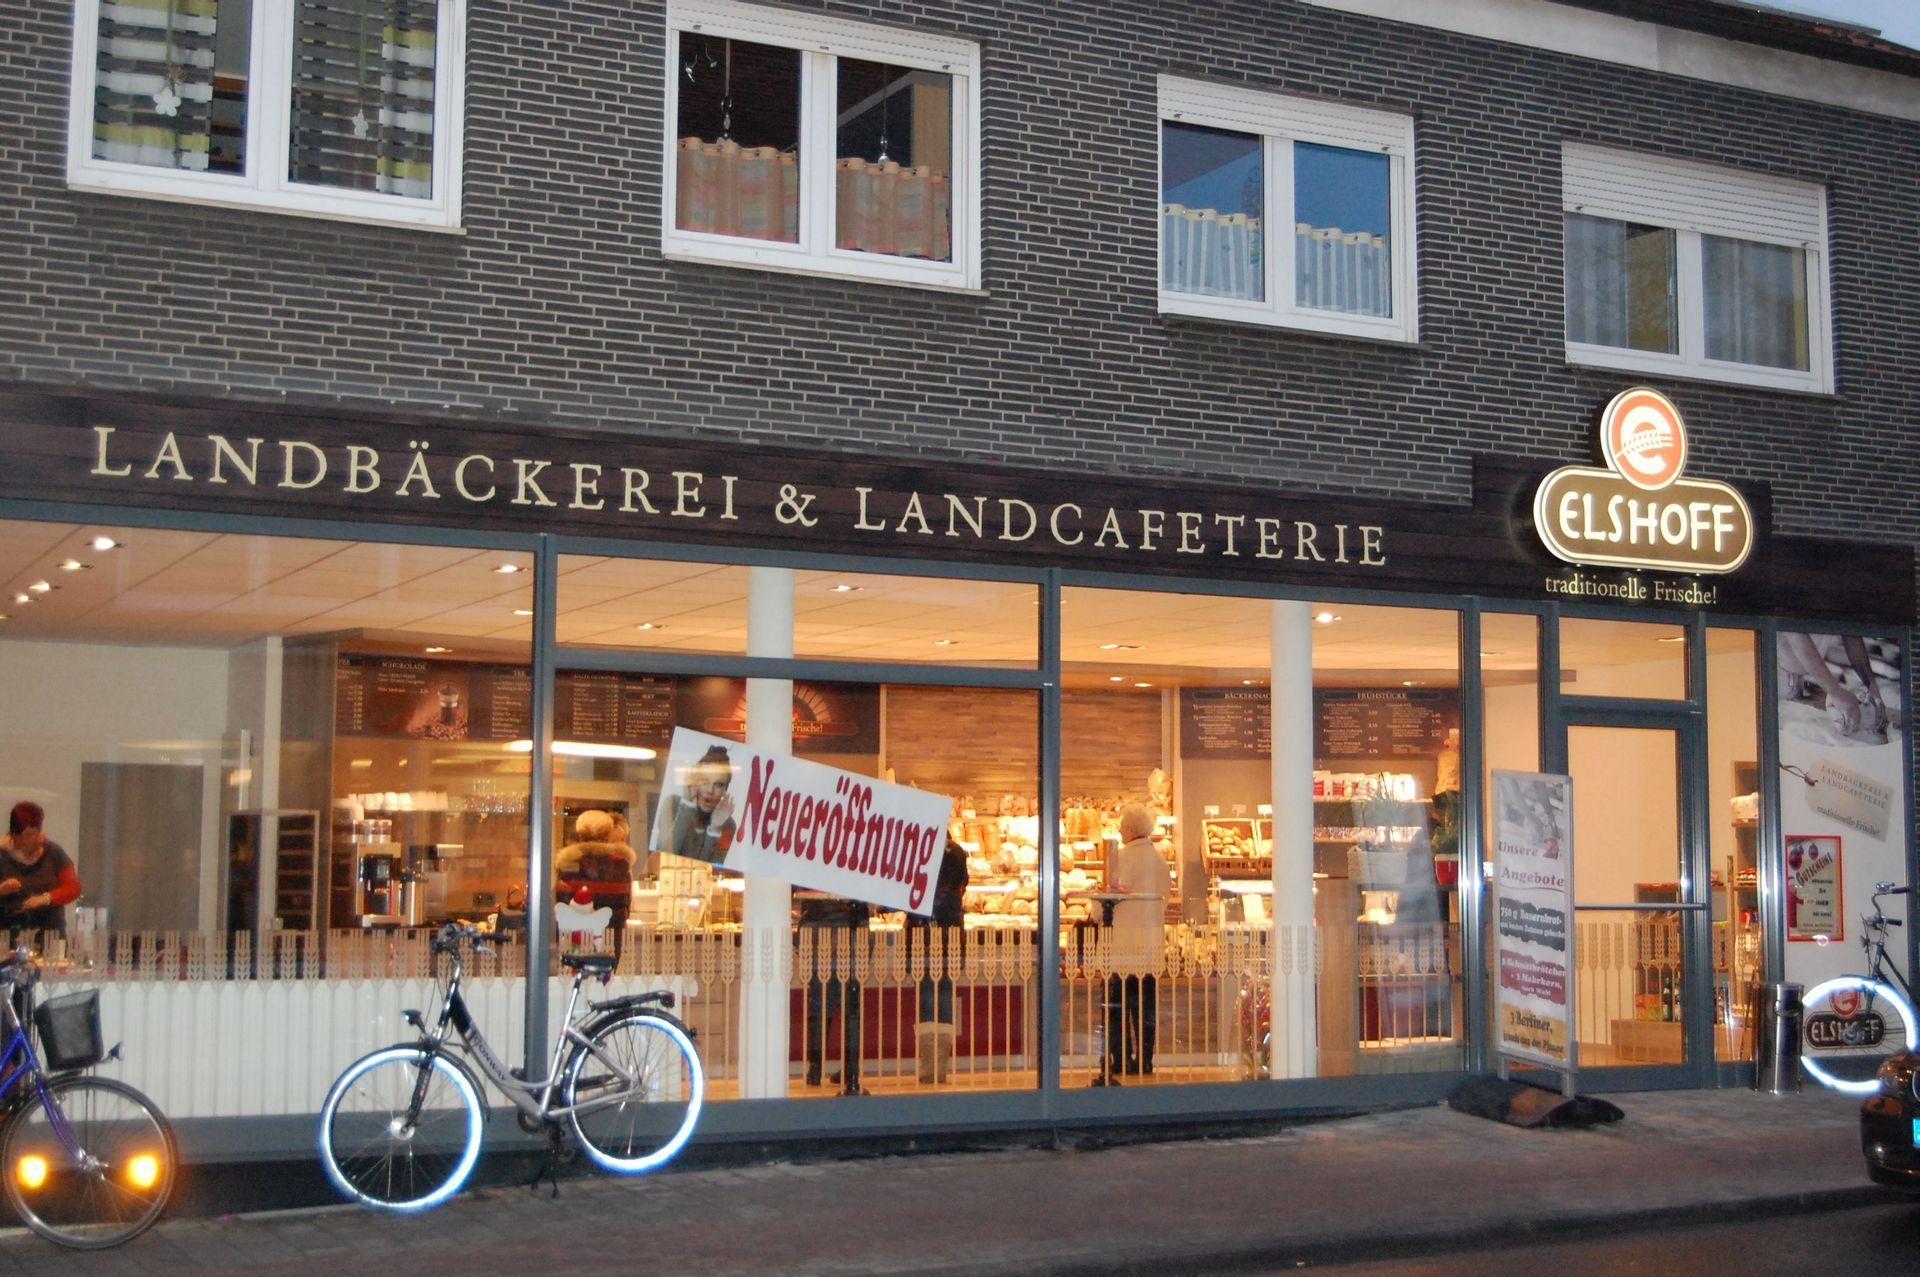 Bäckerei- Café in Steinfurt-Borghorst -